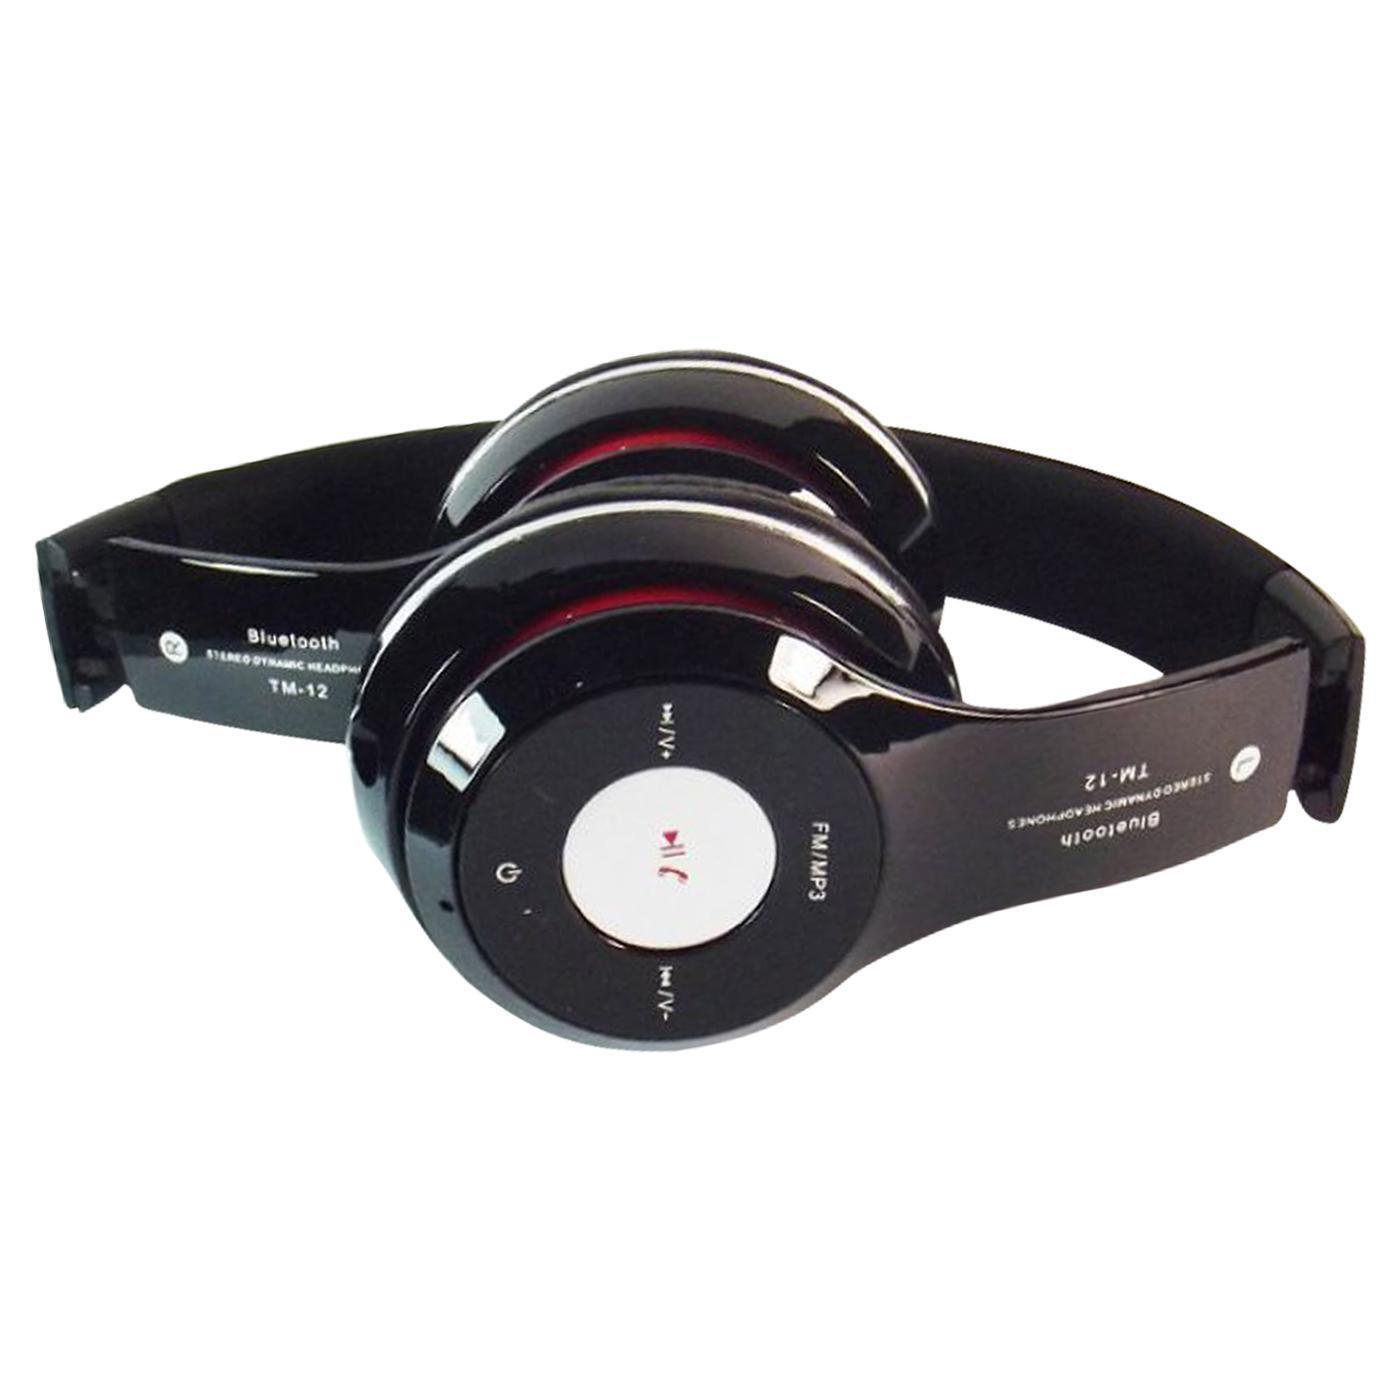 STN 13 Bluetooth Wireless Headphone